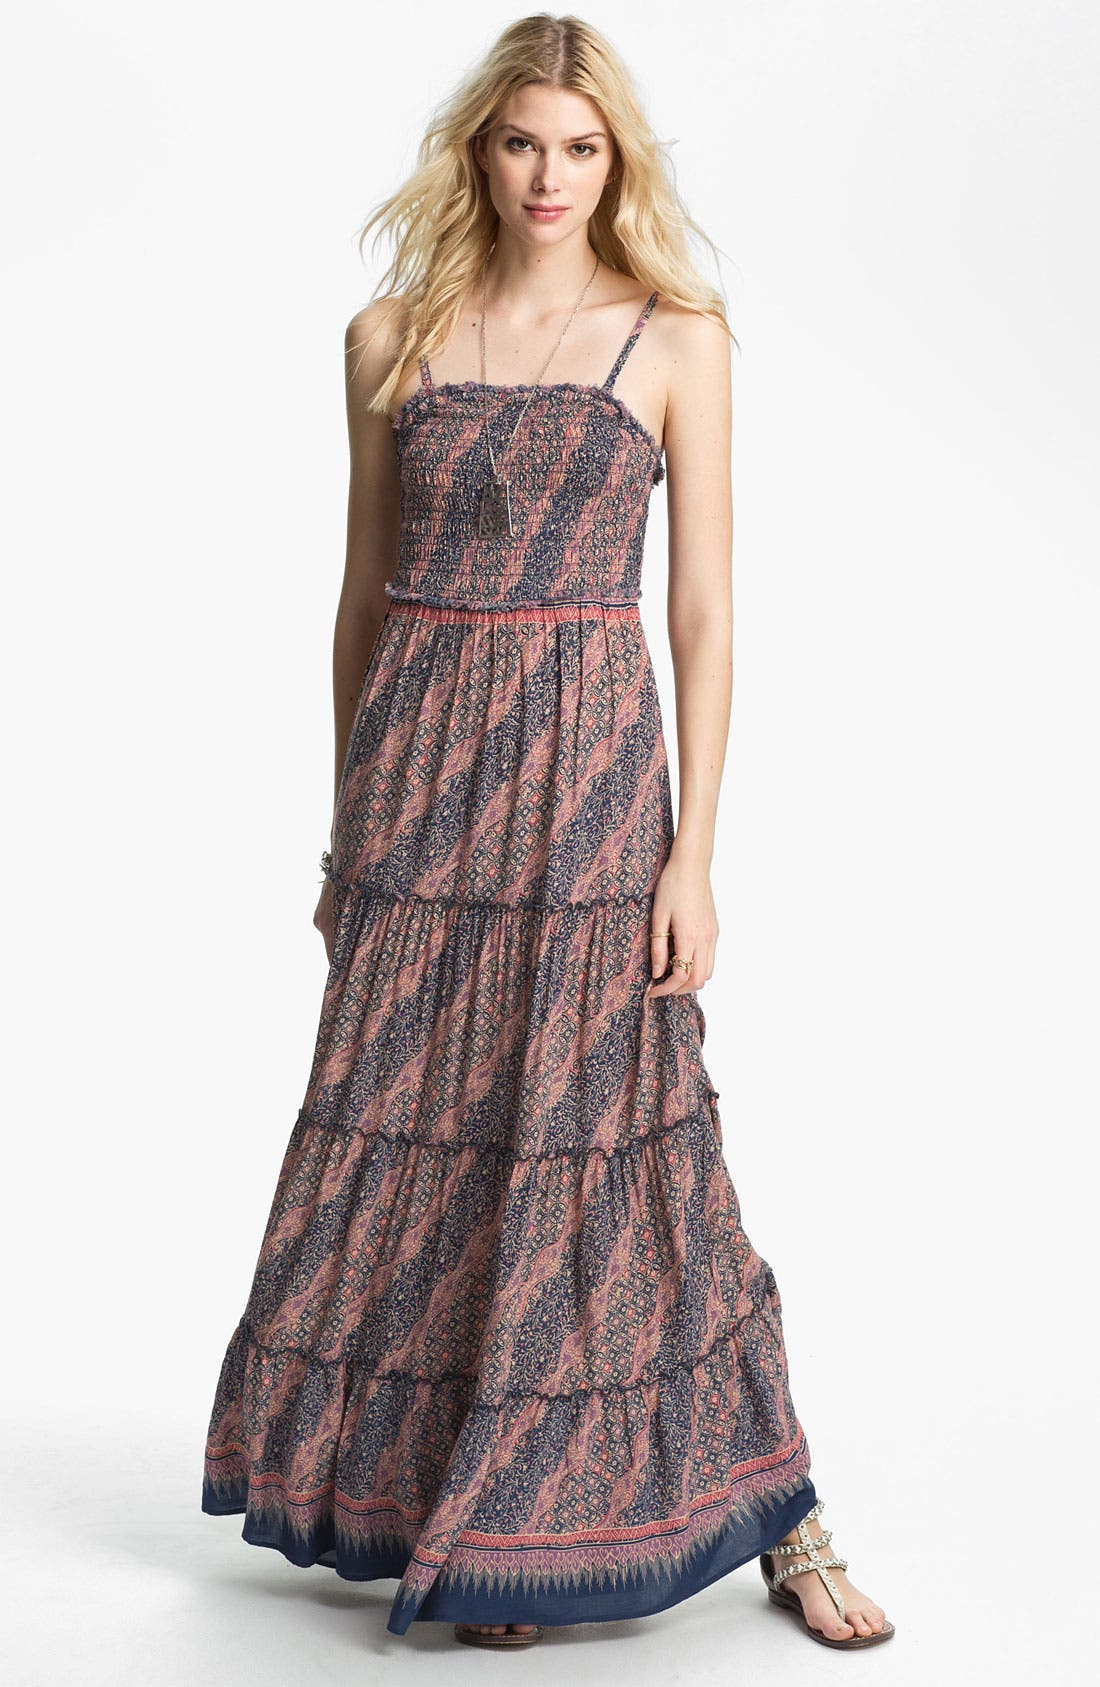 Main Image - Free People Vintage Print Tiered Maxi Dress